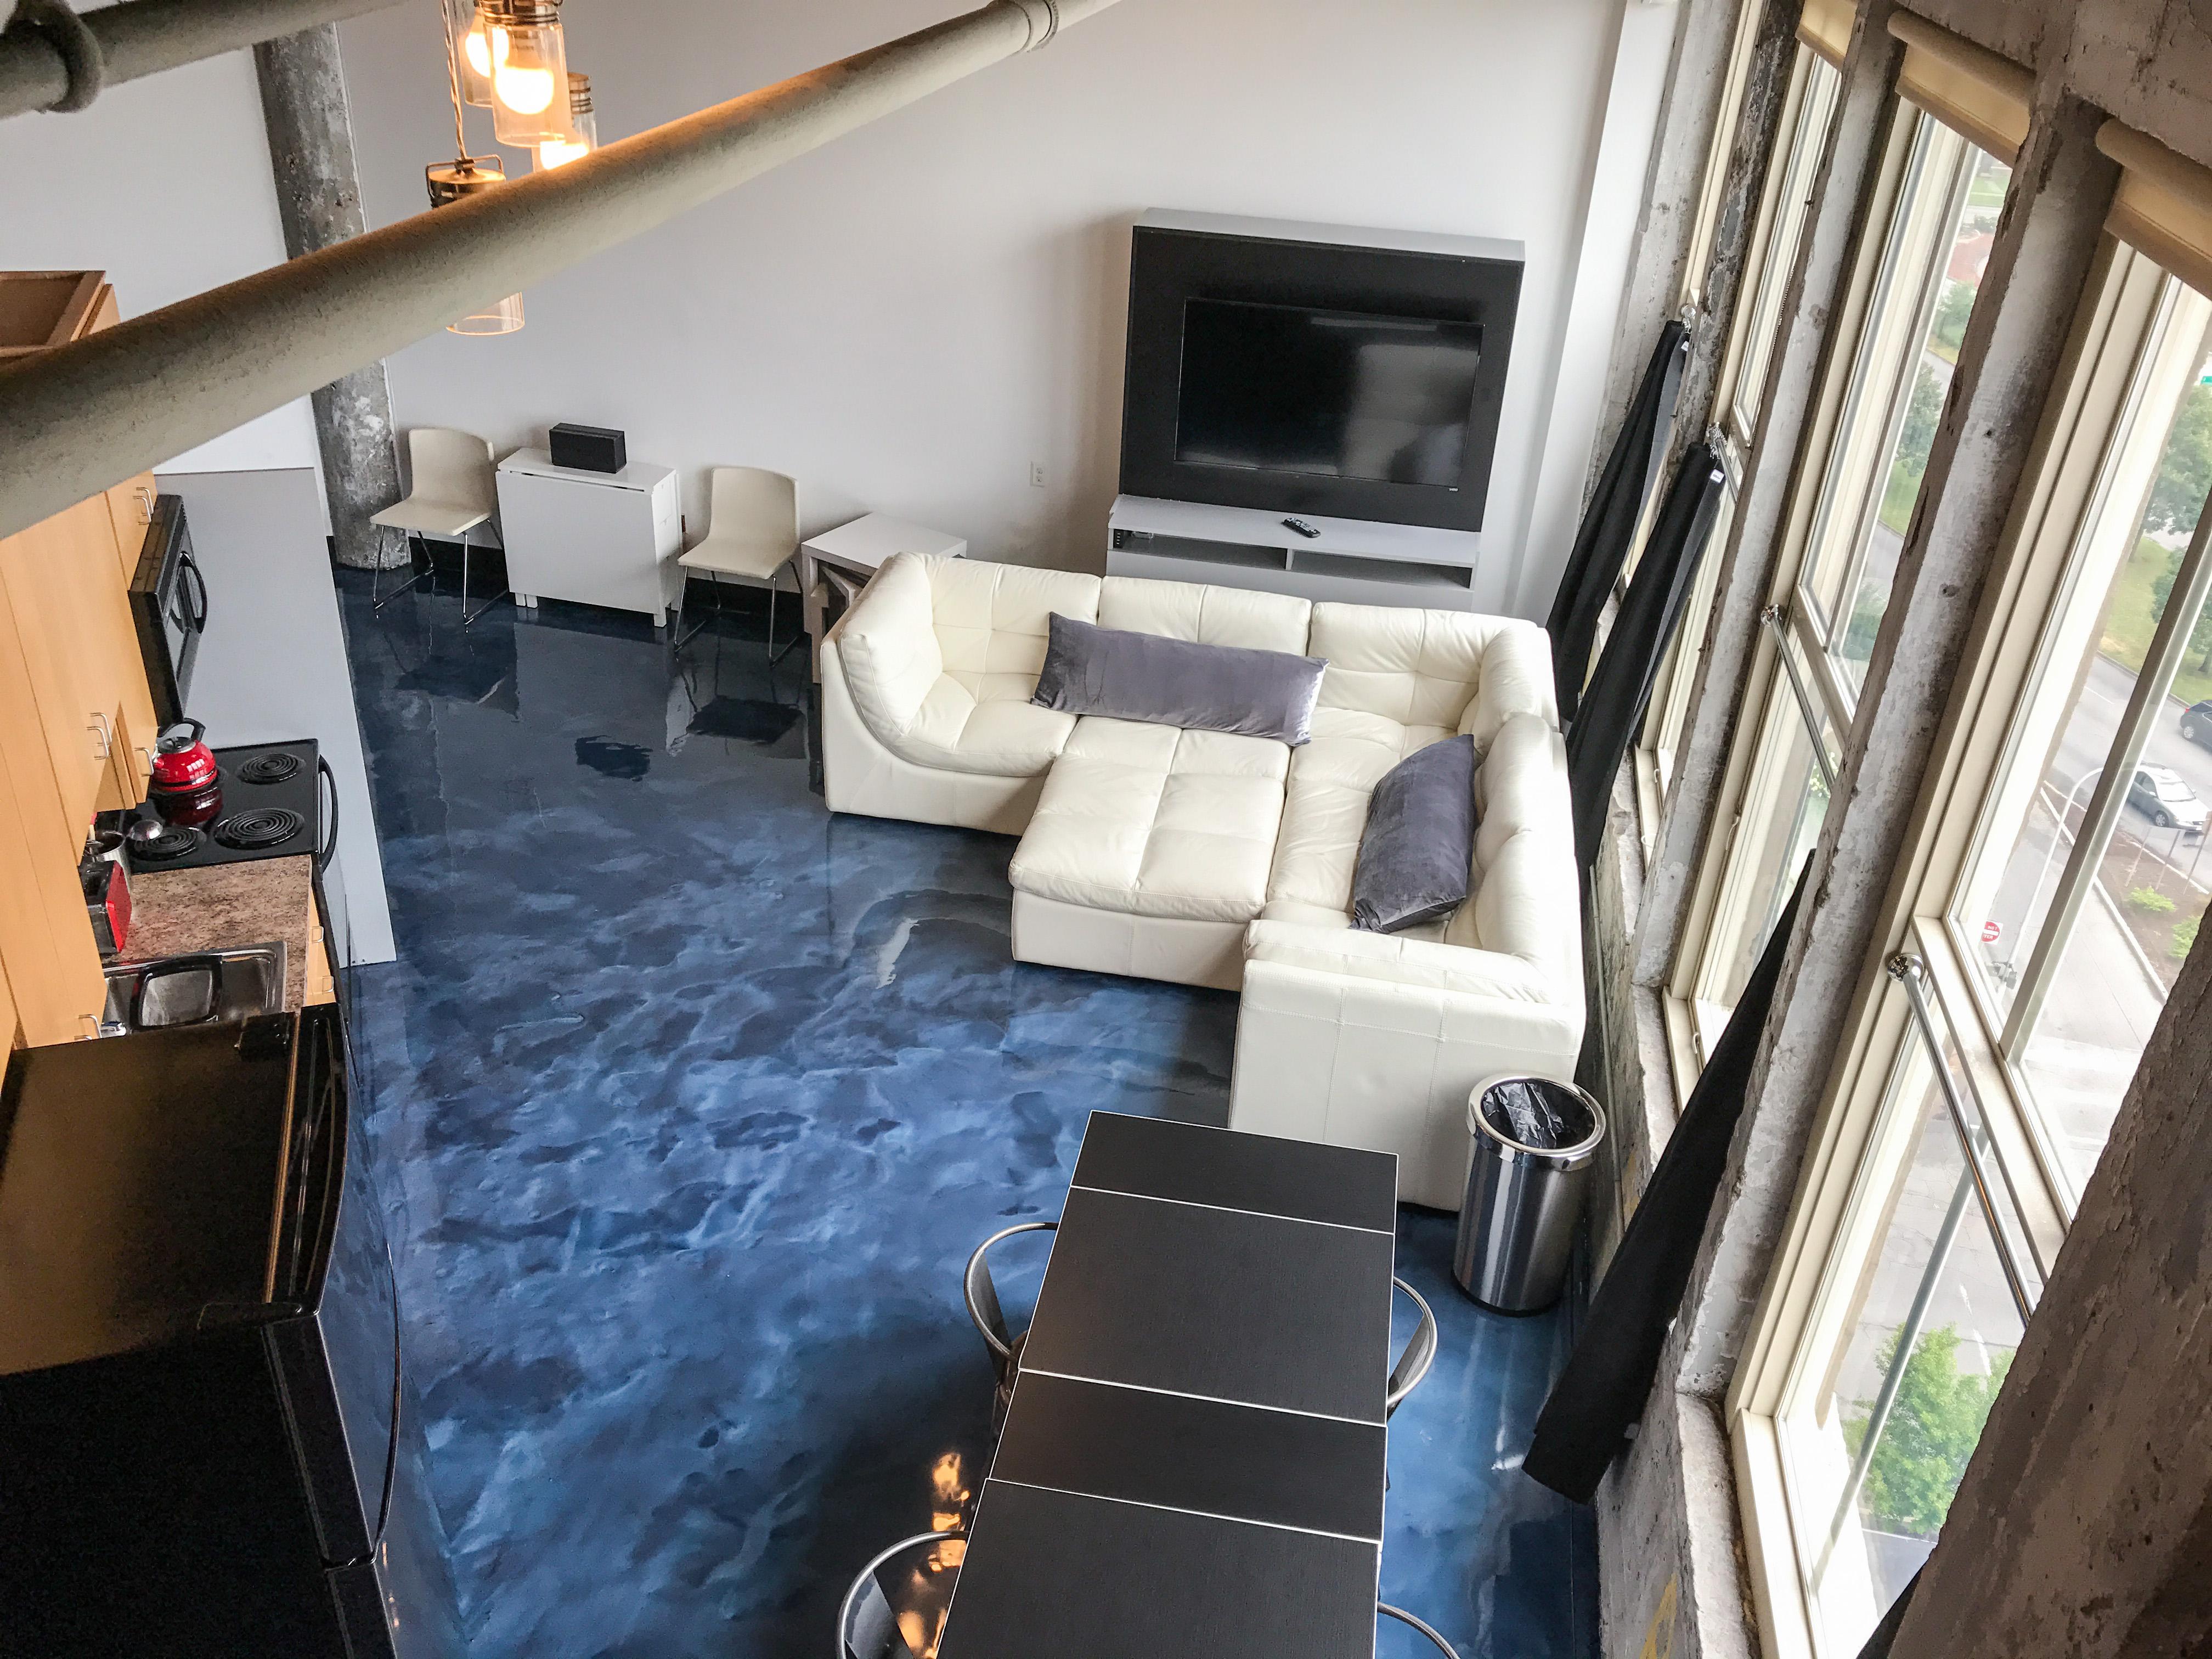 Loft Reverie Hotel 805 - A Modern Loft Hotel Downtown Louisville + Lounge Pits + Full Kitchens + HDT